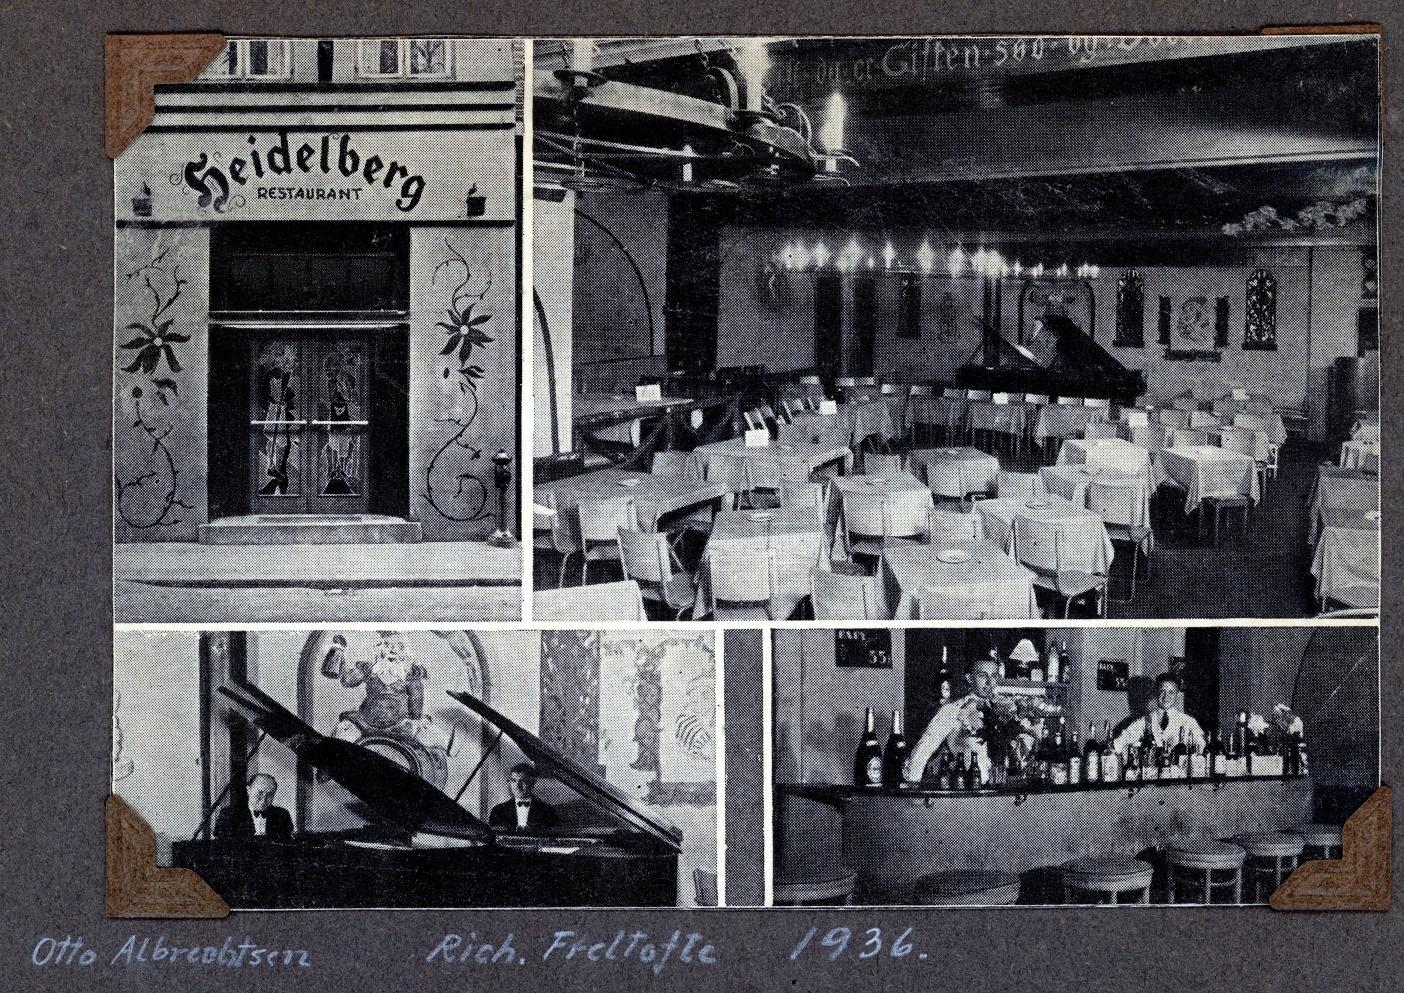 70.321 Heidelberg restaurant 1936.